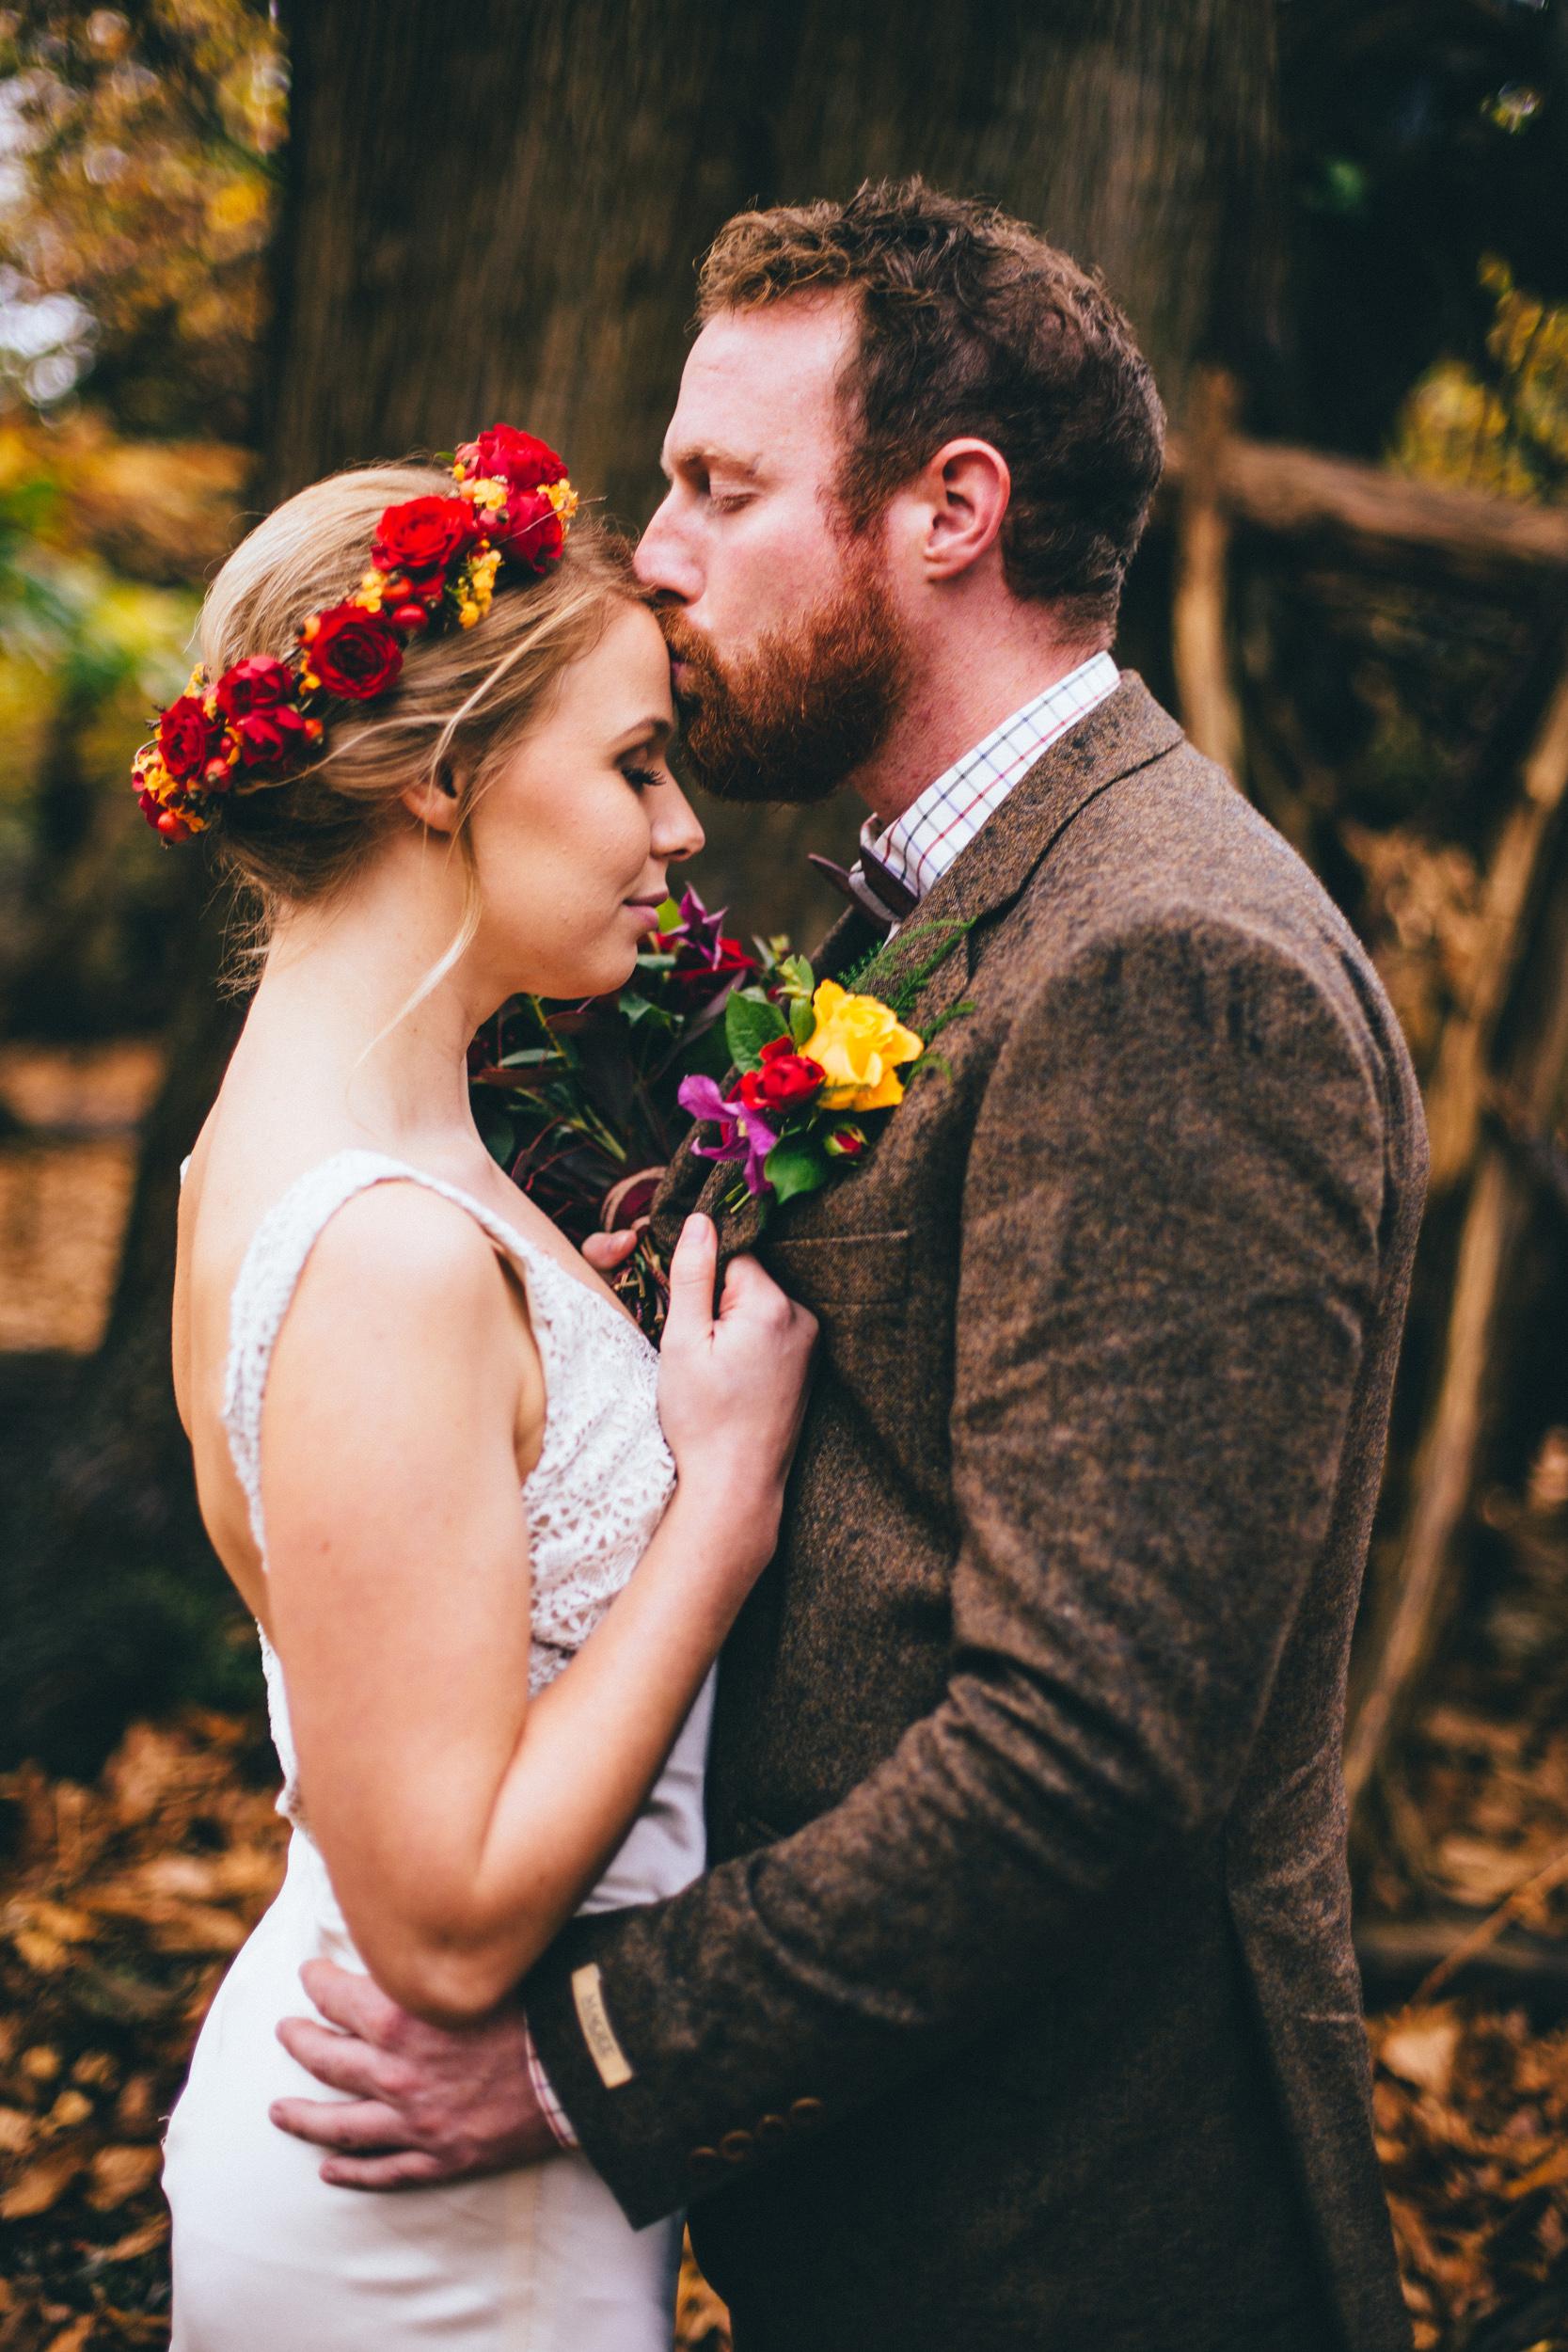 Kate-Beaumont-Wedding-Dresses-Autumn-Shoot-Rebecca-Tovey-7.jpg